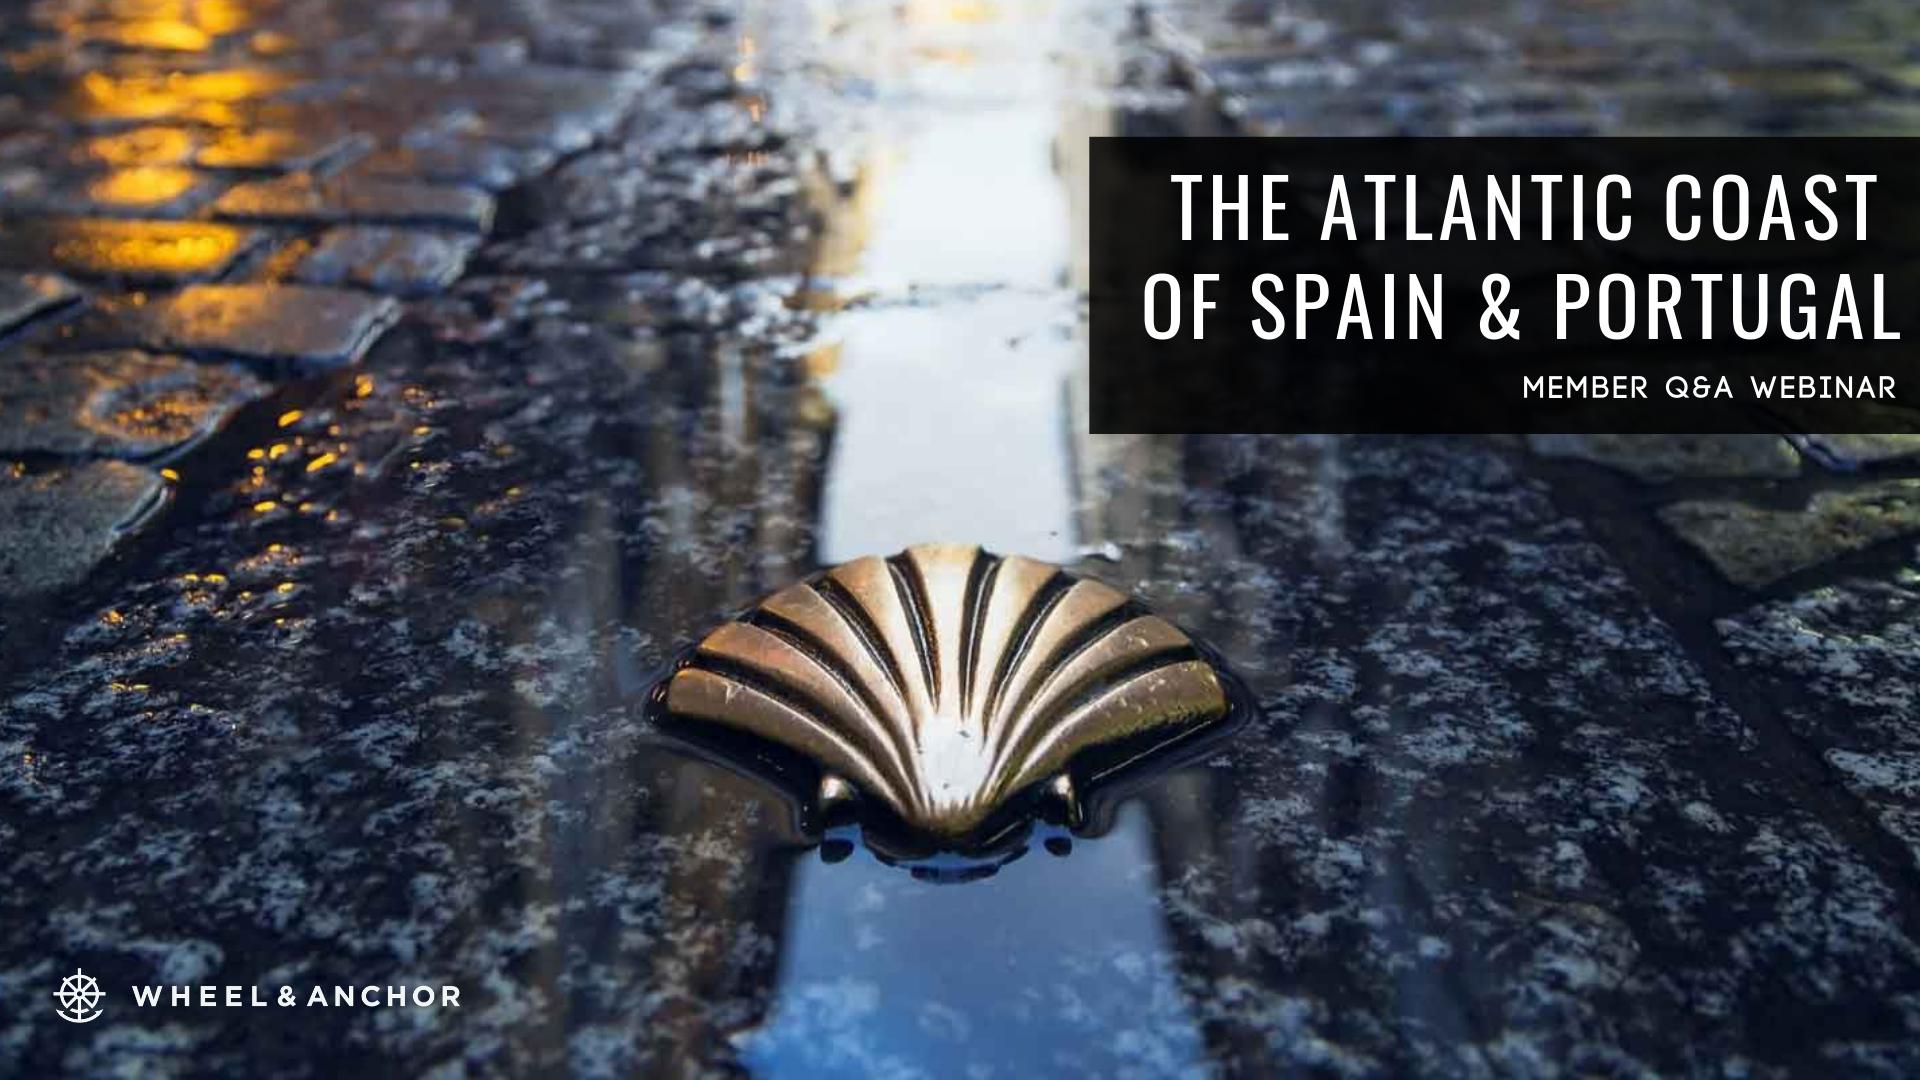 Webinar Replay: The Atlantic Coast of Spain & Portugal